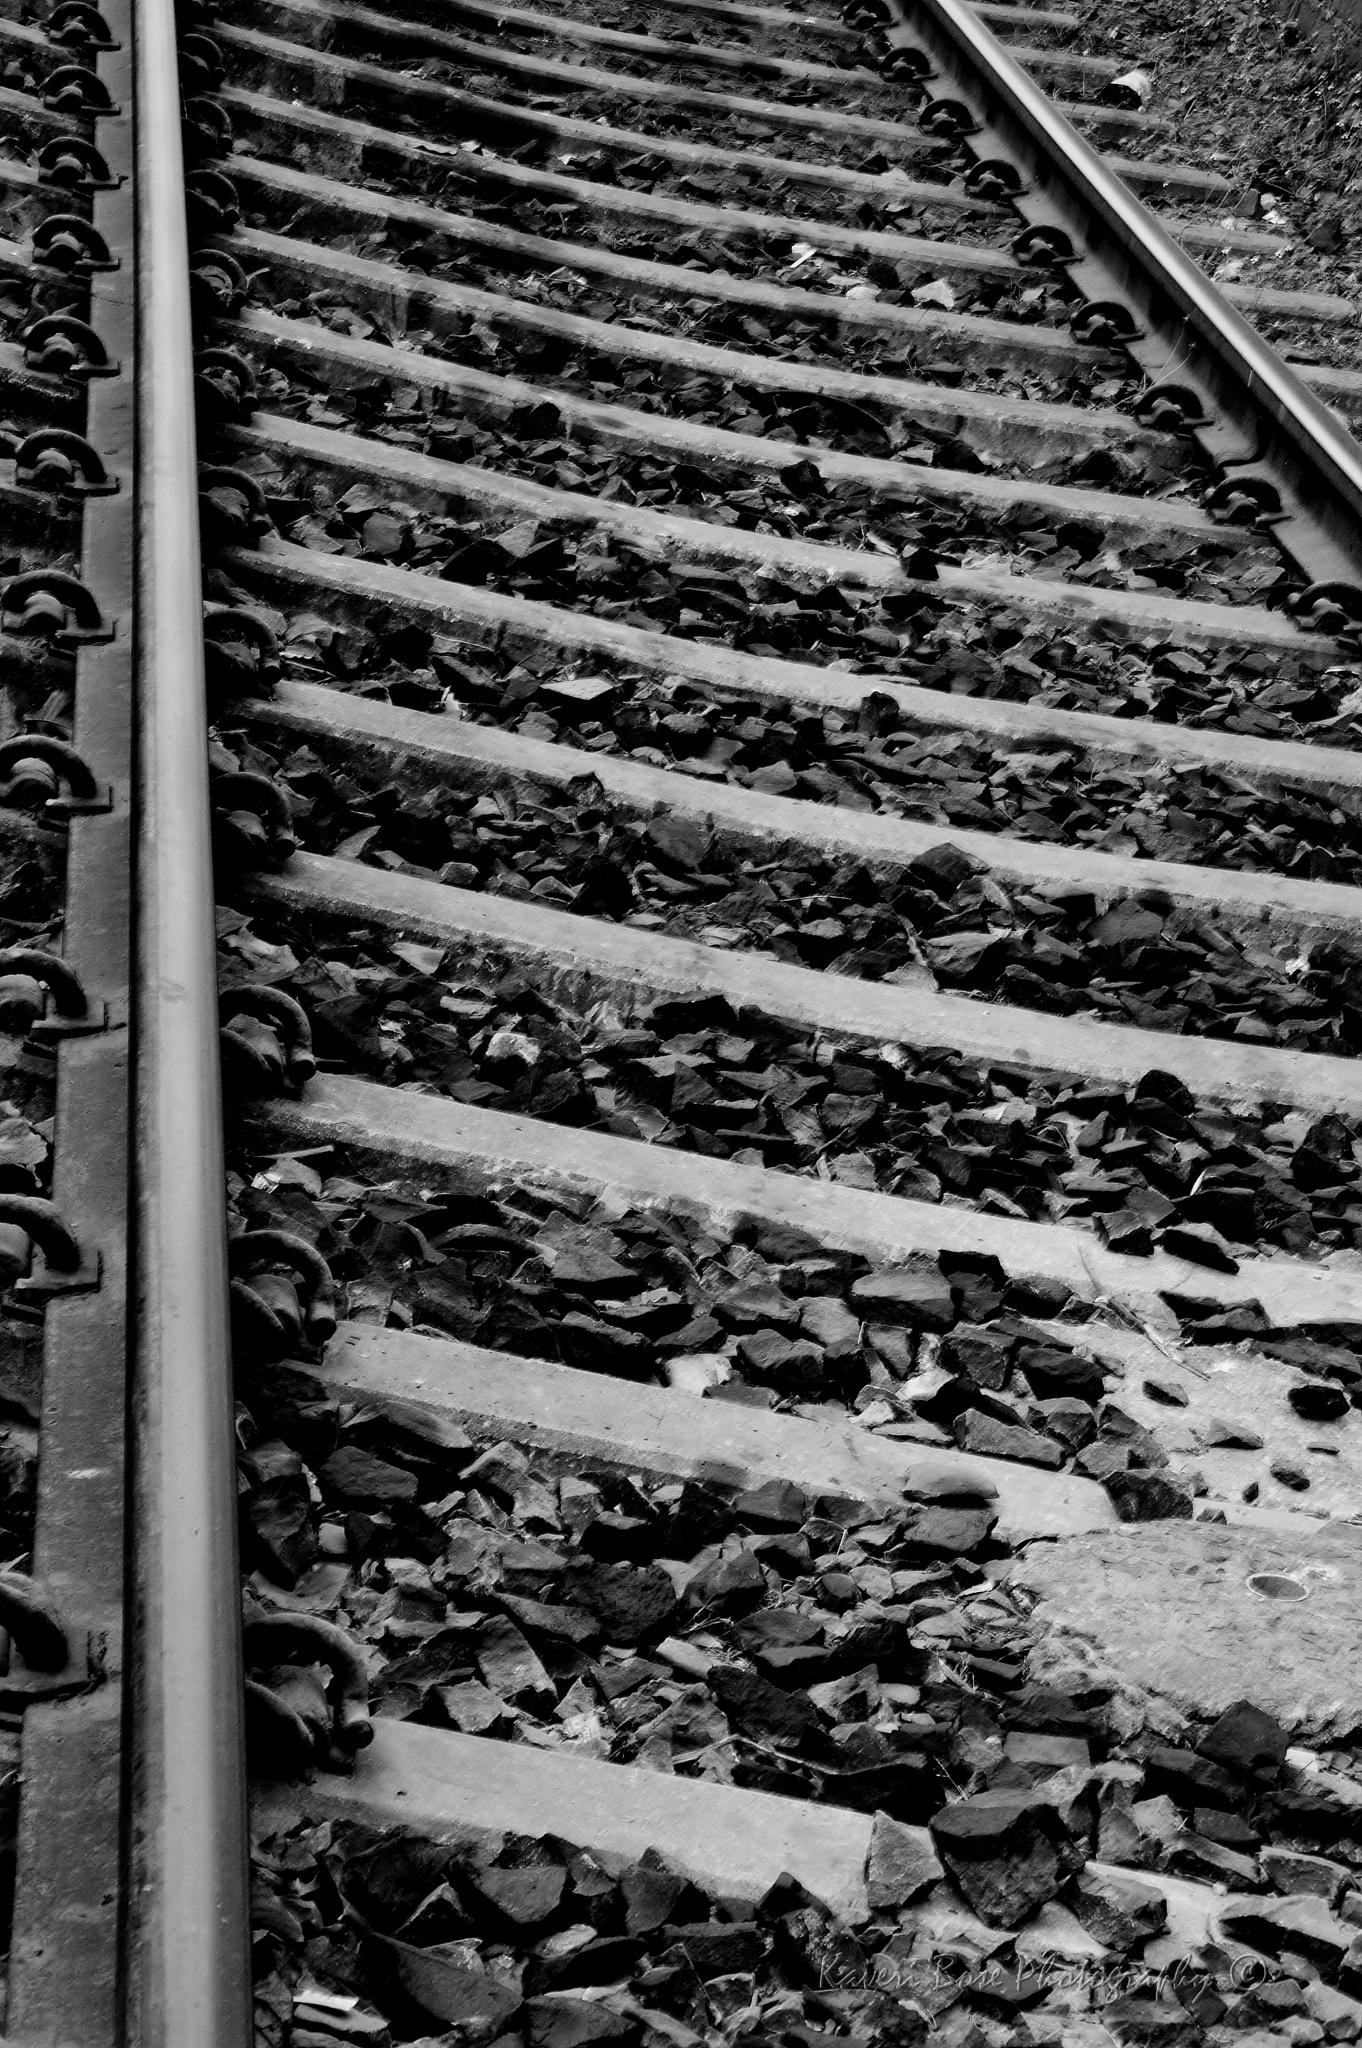 Railway Tracks by Kaveri Bose